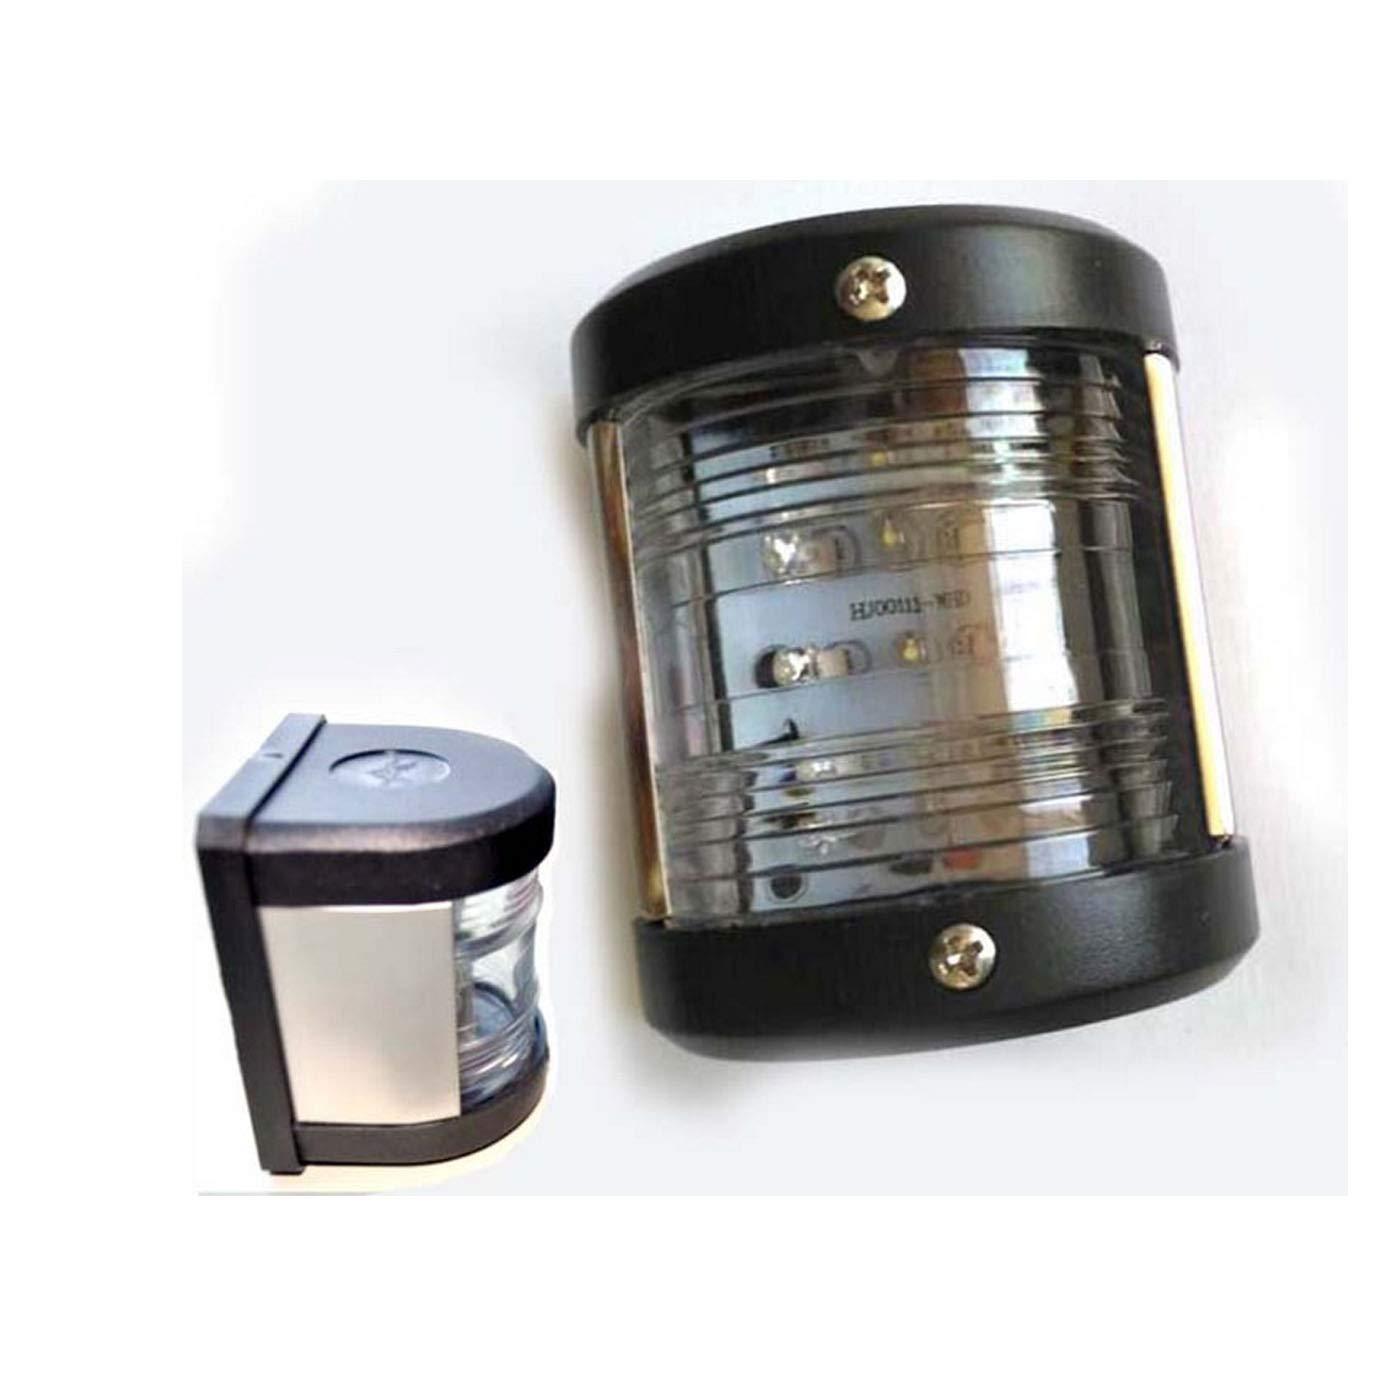 1 Pc 12V Stainless Steel Waterproof Navigation LED Light 135 Degrees Tail Stern Light Port Bulb for Boat Marine Yacht